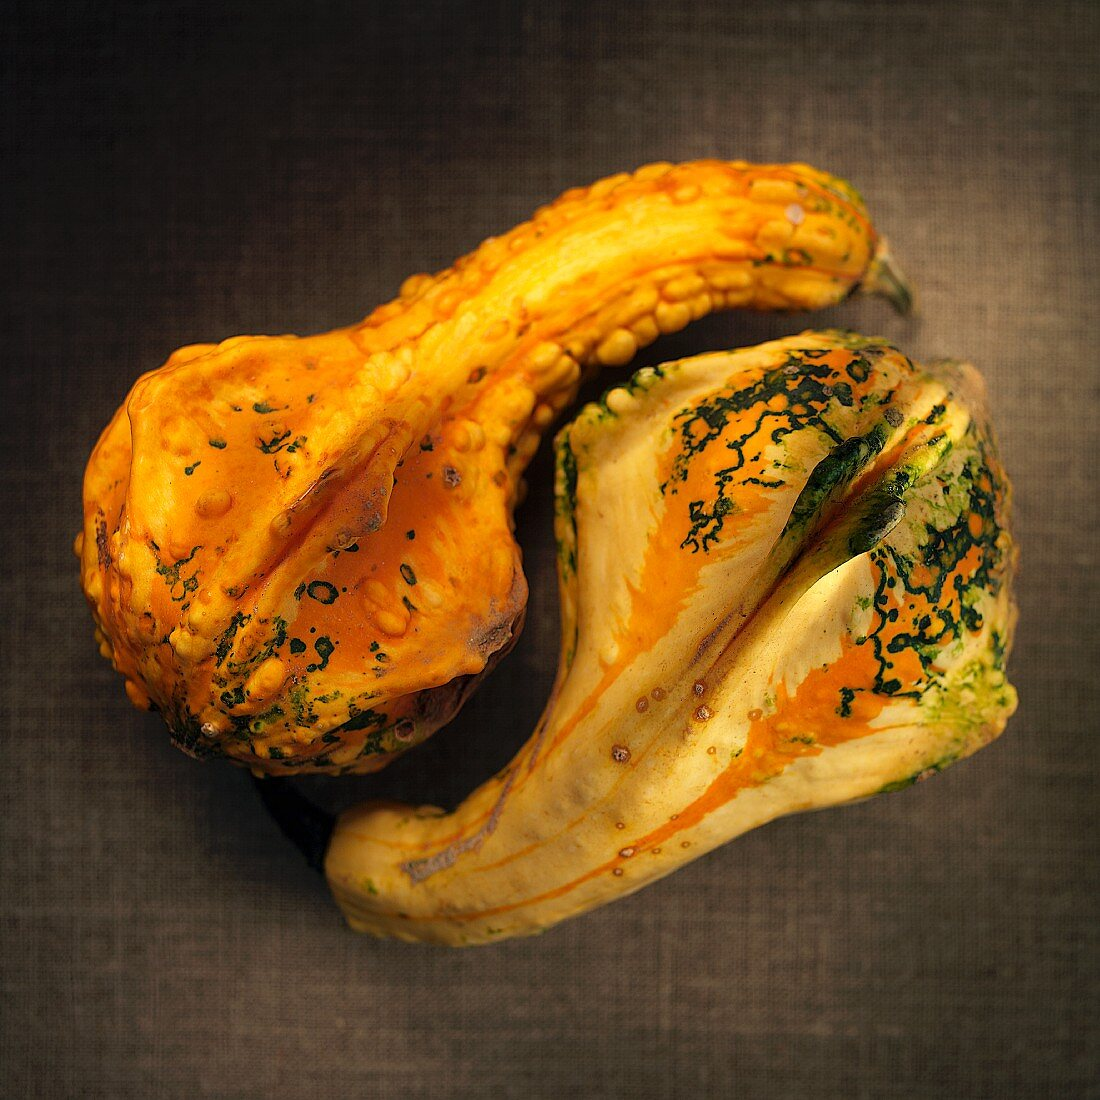 Two ornamental gourds